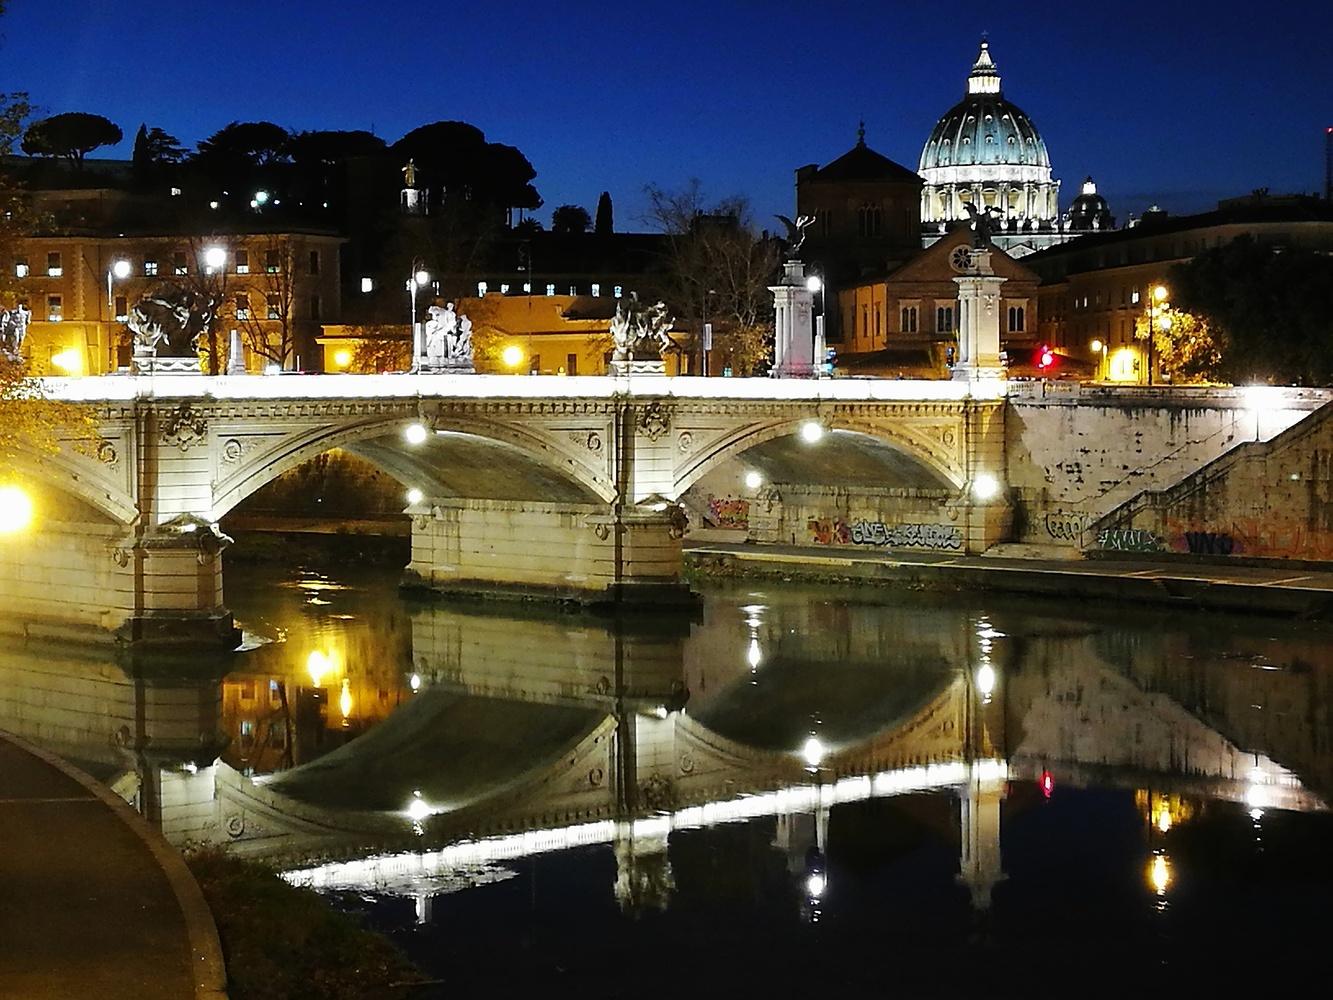 The magic of Rome by Riccardo Mattei